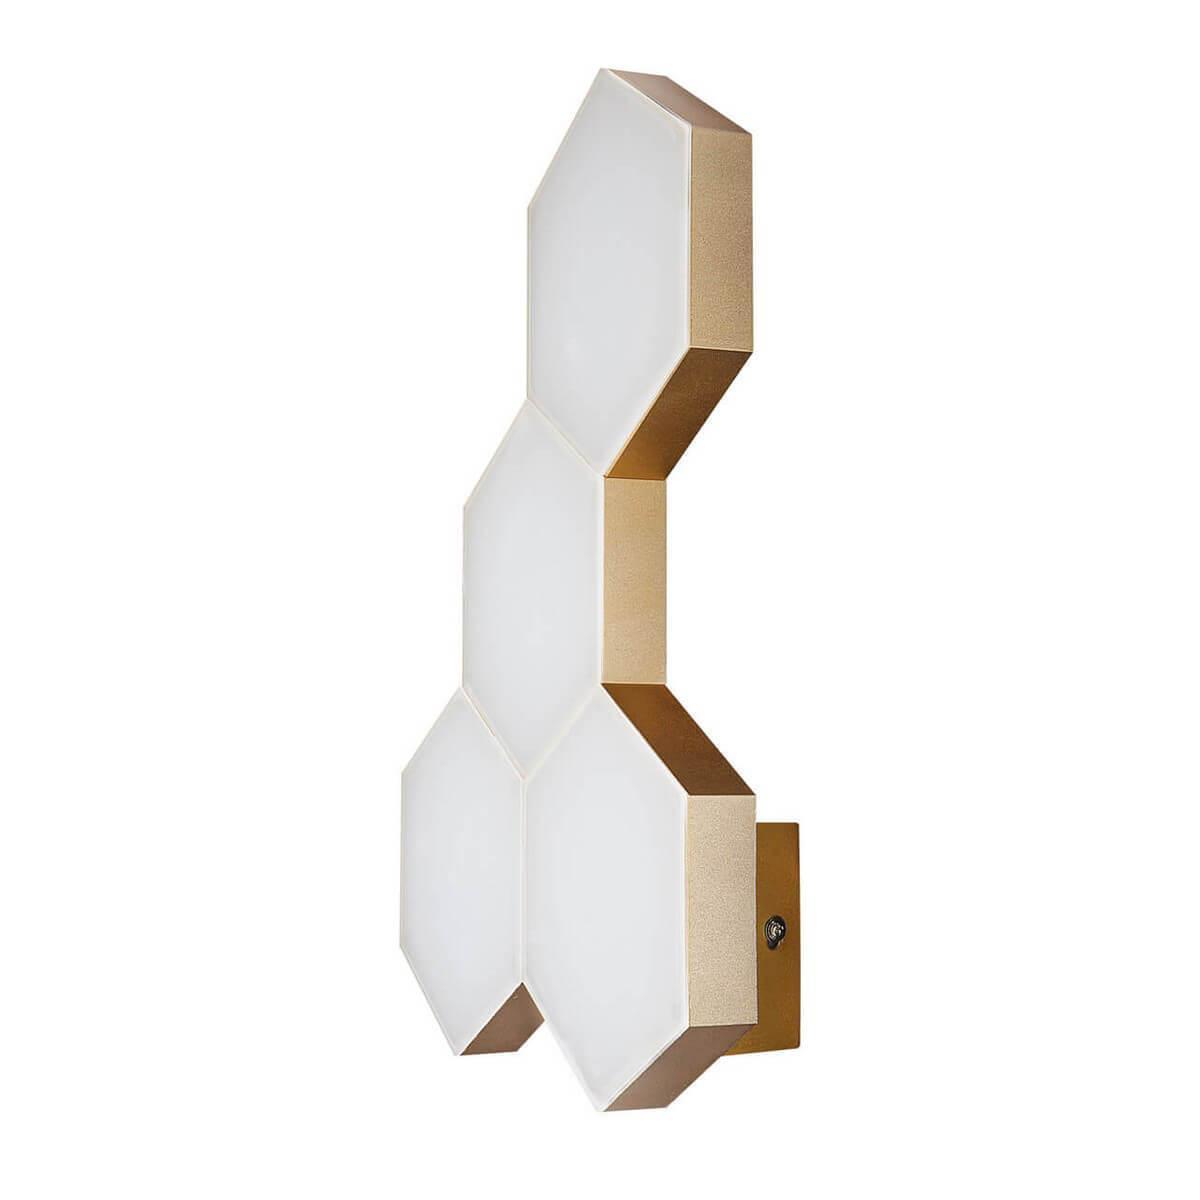 Настенный светильник Lightstar 750643, LED, 20 Вт цены онлайн